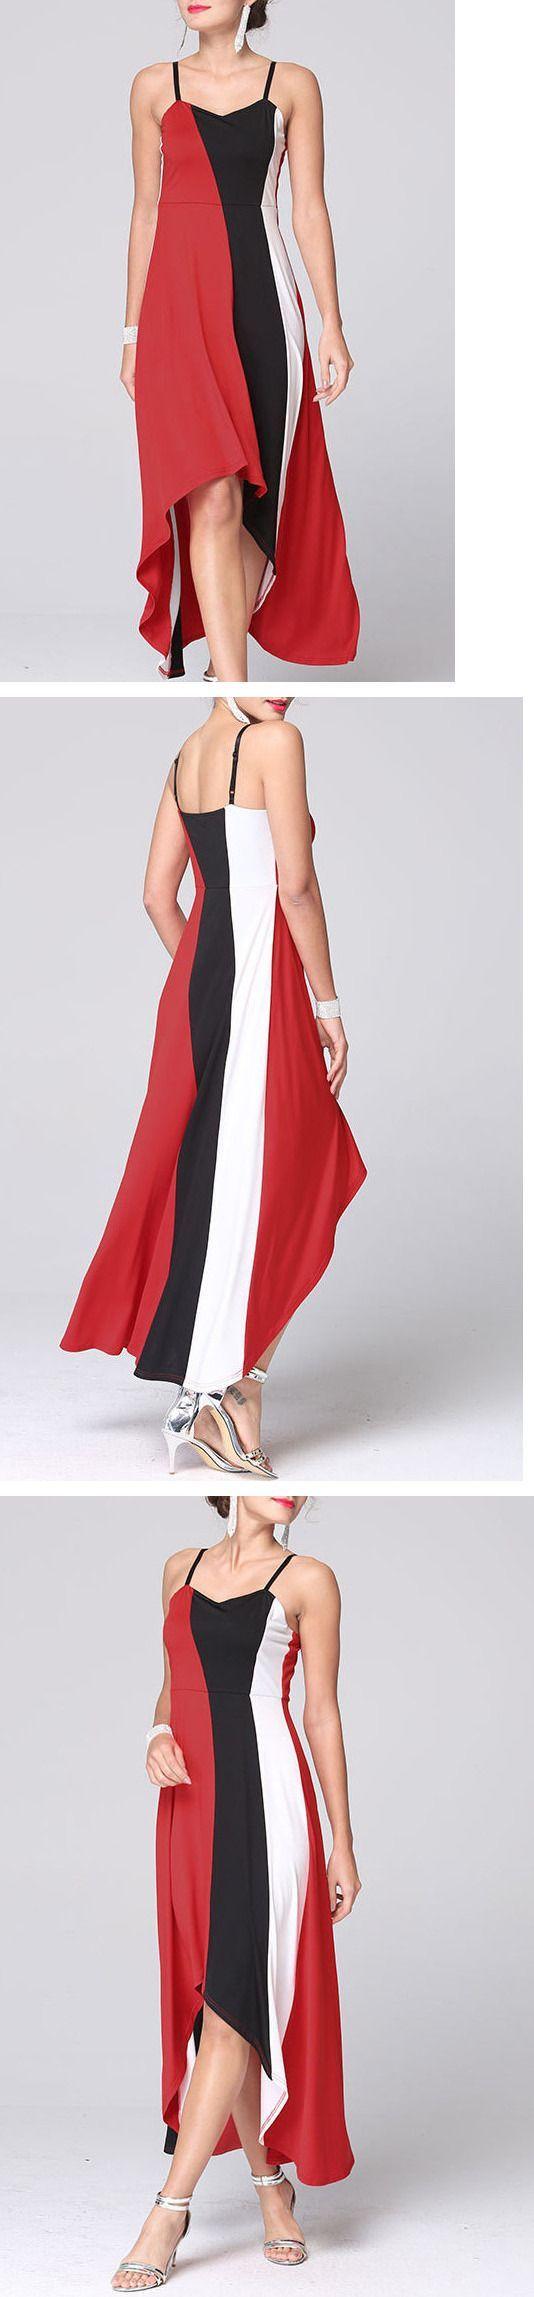 Red Color Block Asymmetrical Midi Dress